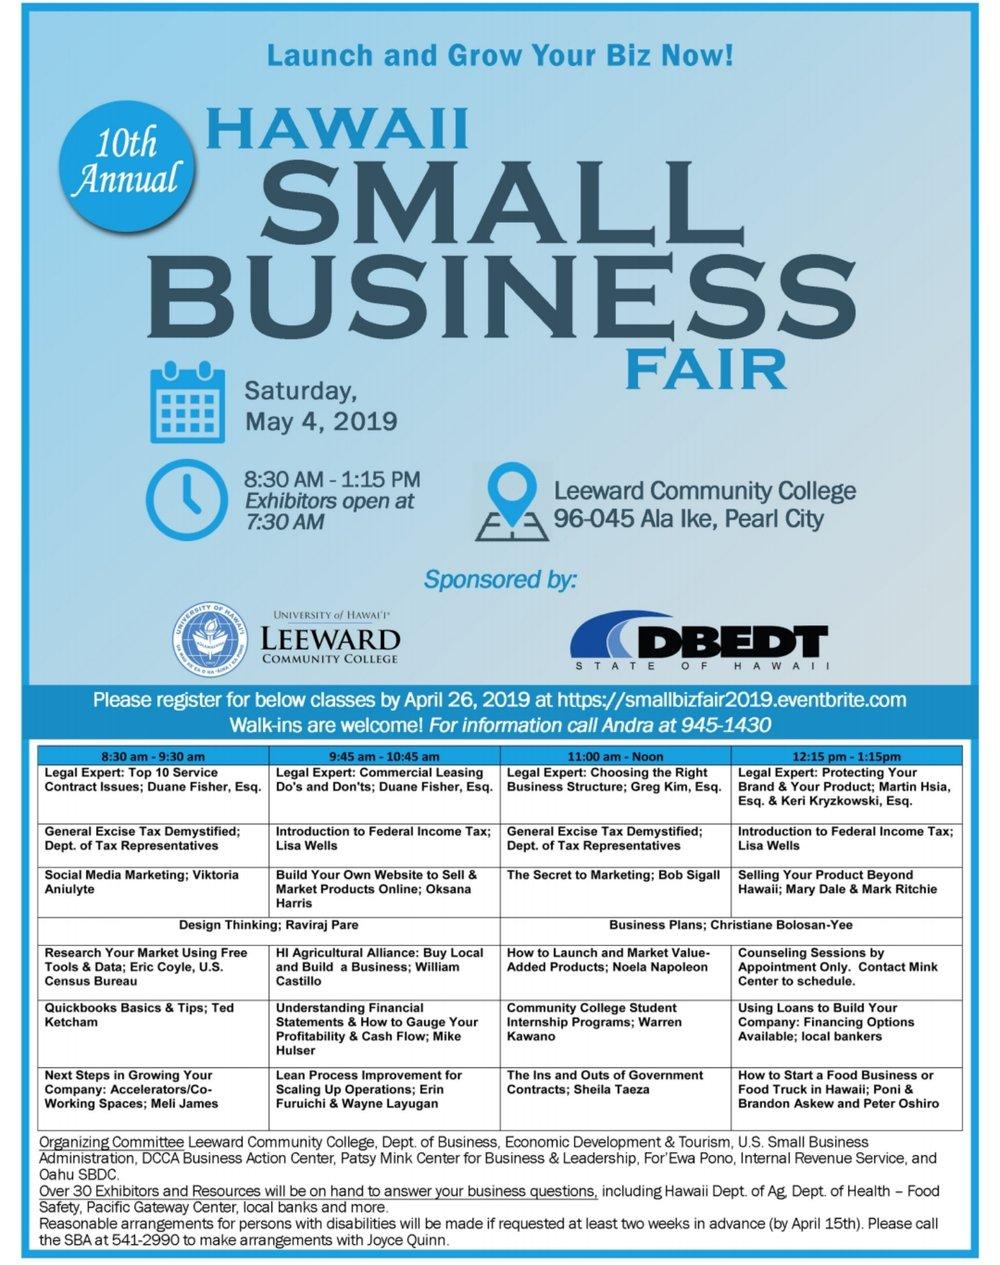 business fair flyer.jpg